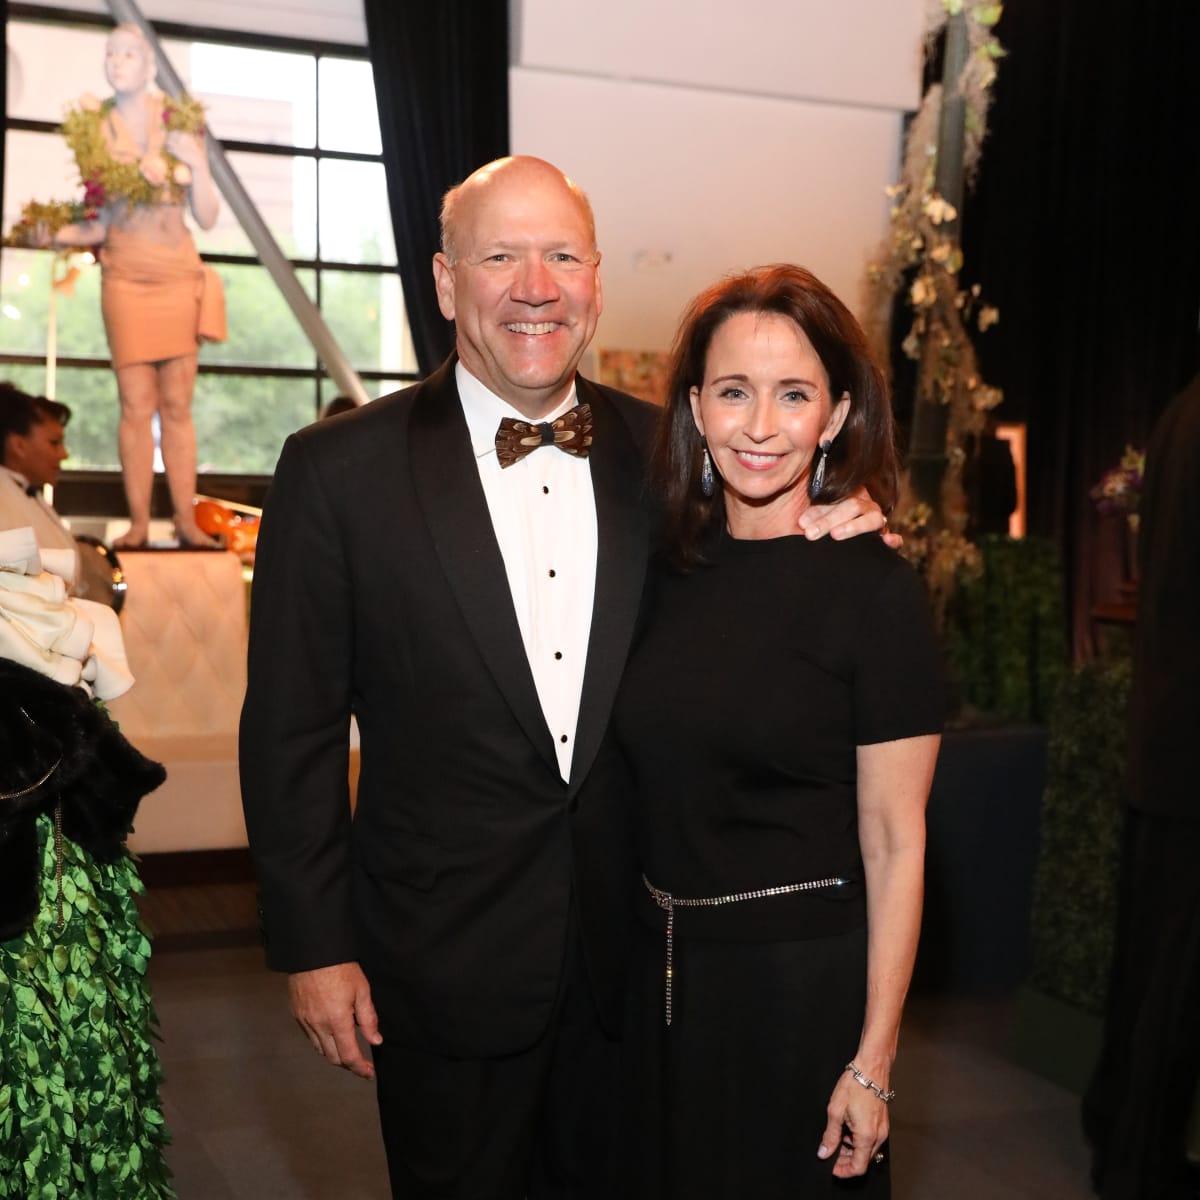 John and Ellen Rutherford